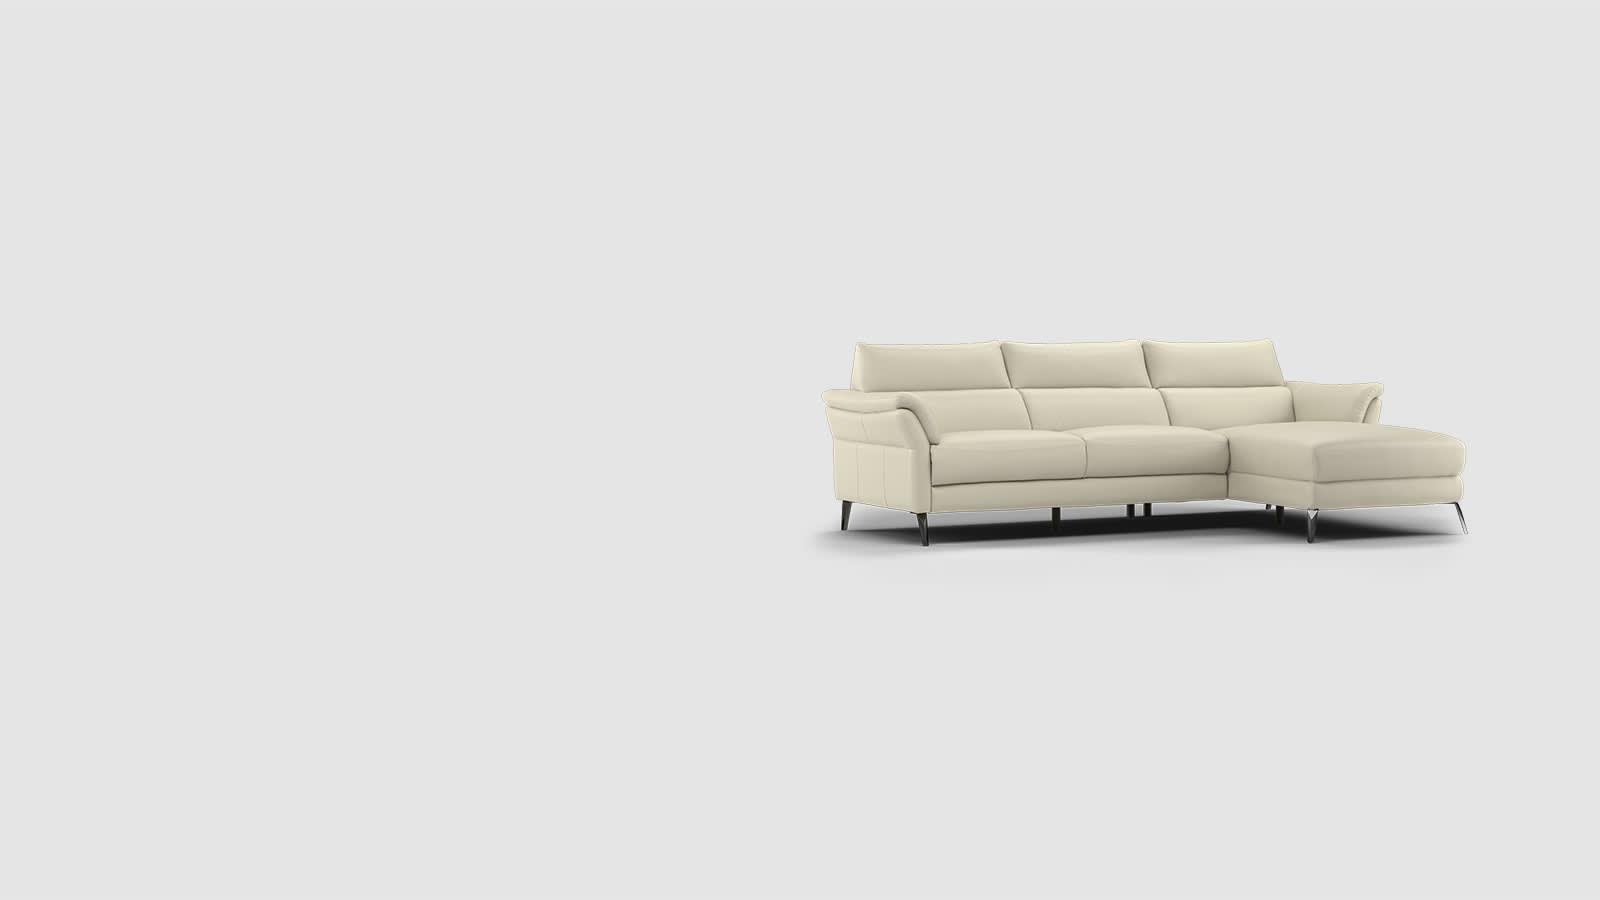 Sofology cream leather Missouri sofa